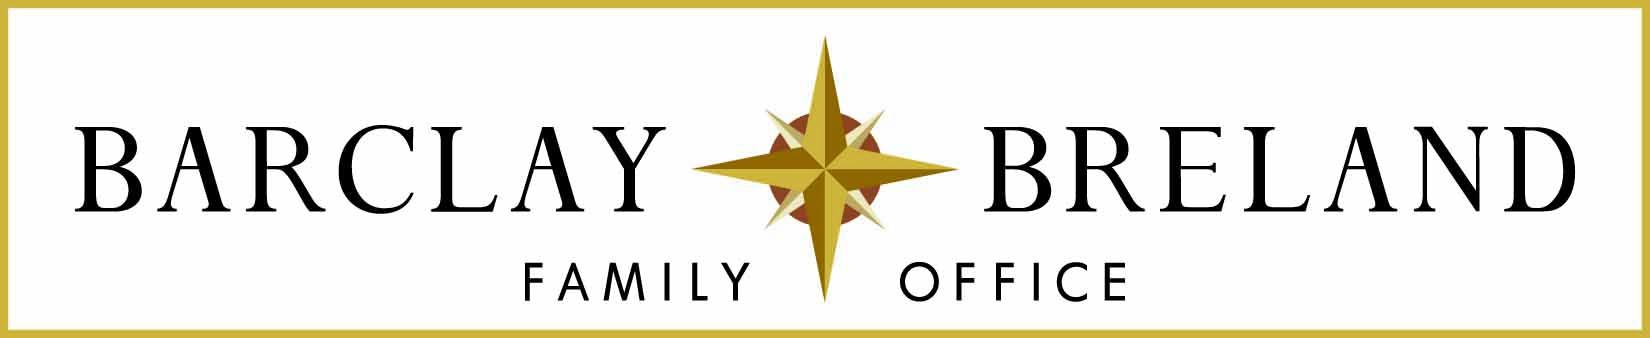 Barclay Breland logo.jpg